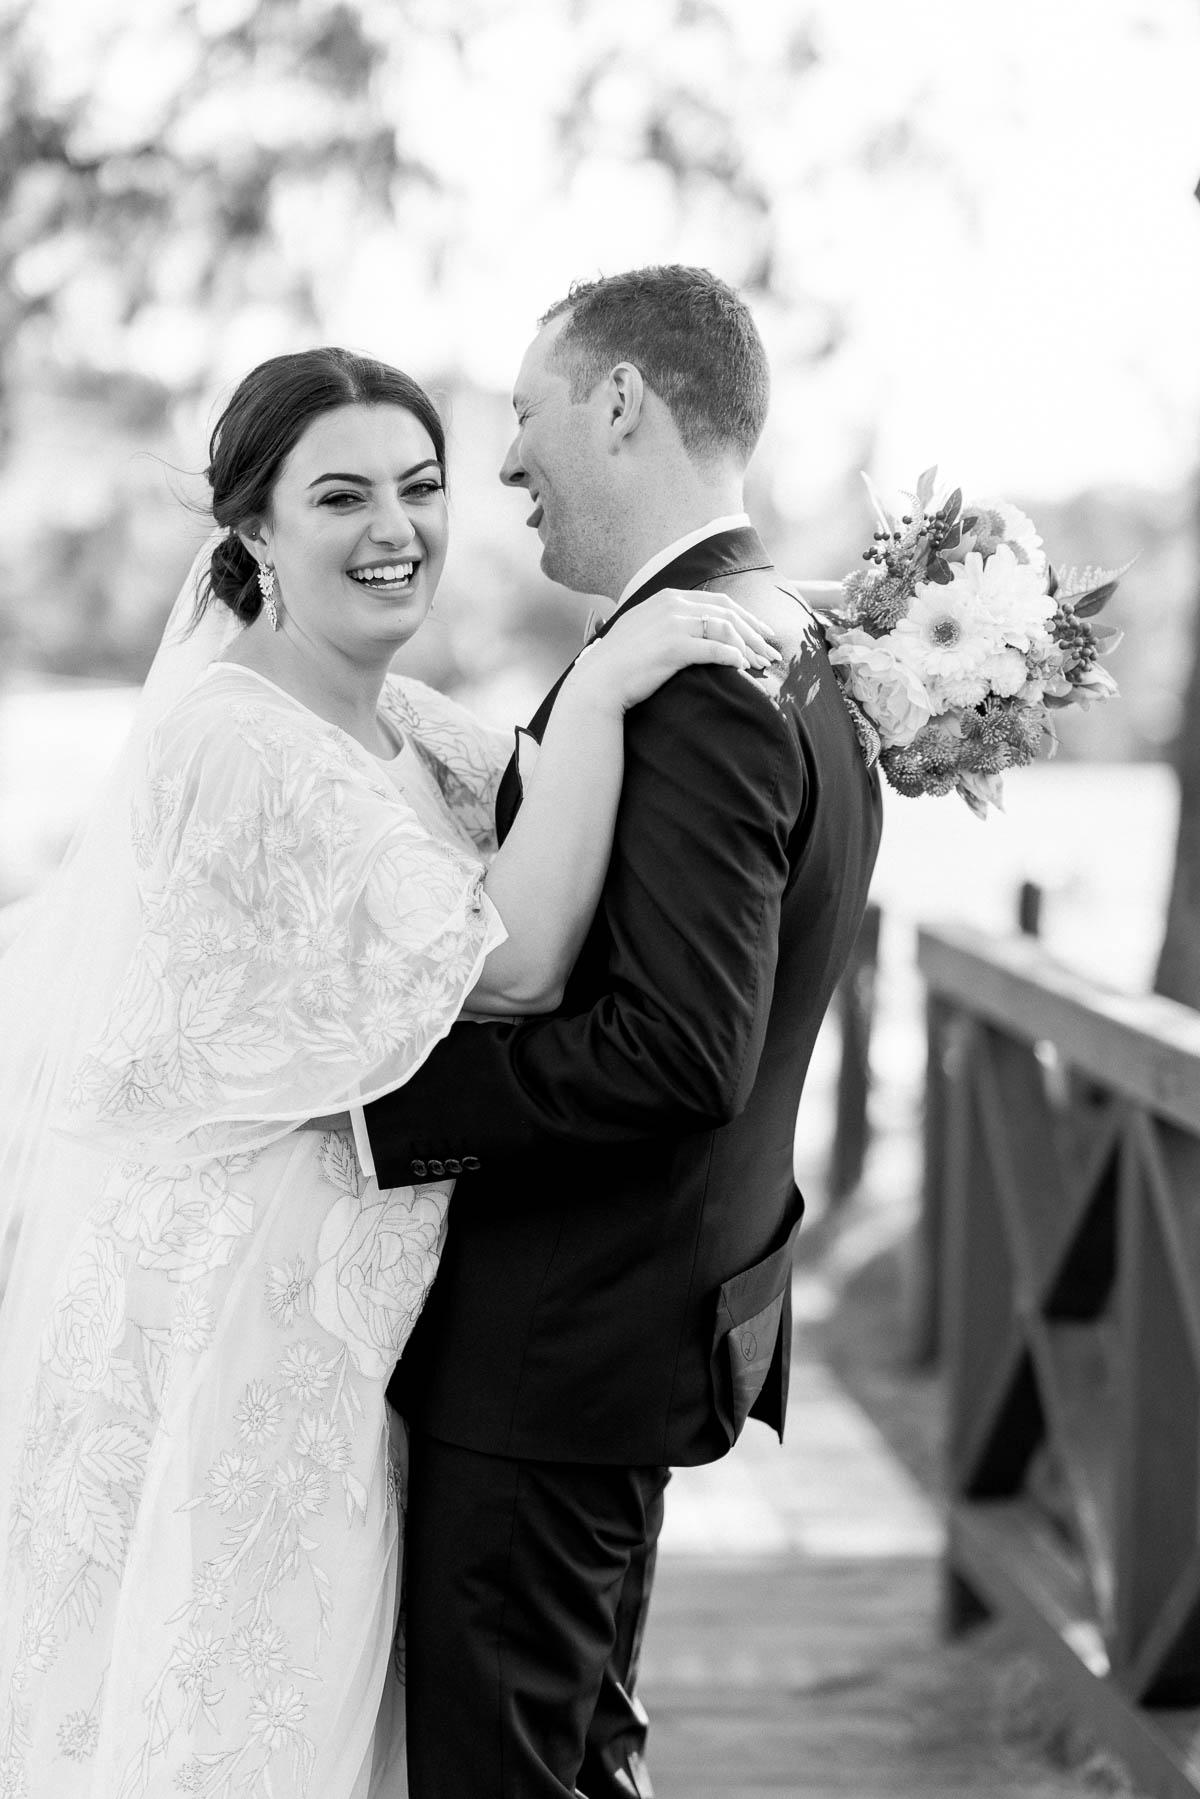 little-henri-cafe-wedding-thornbury-heart+soul-weddings-jane-aaron-05272.jpg